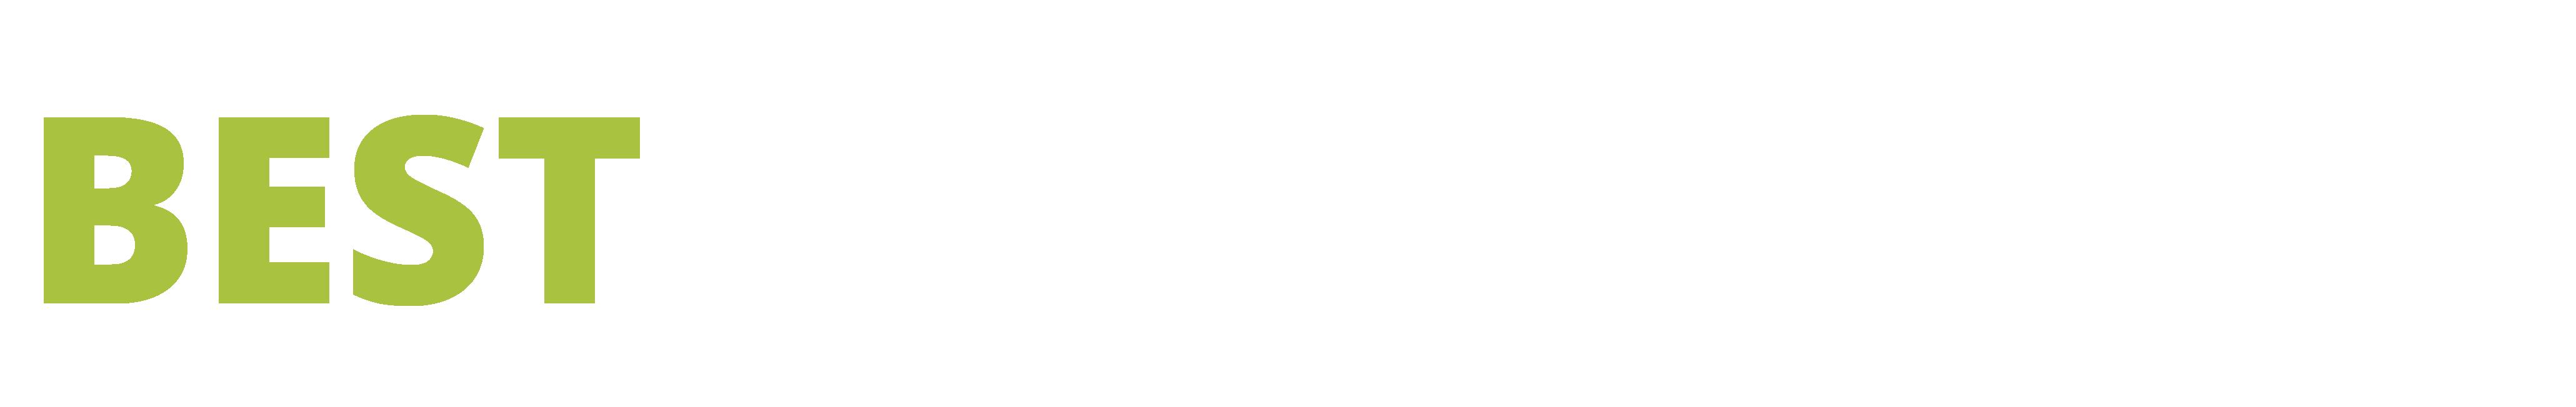 titles-bestcelebration